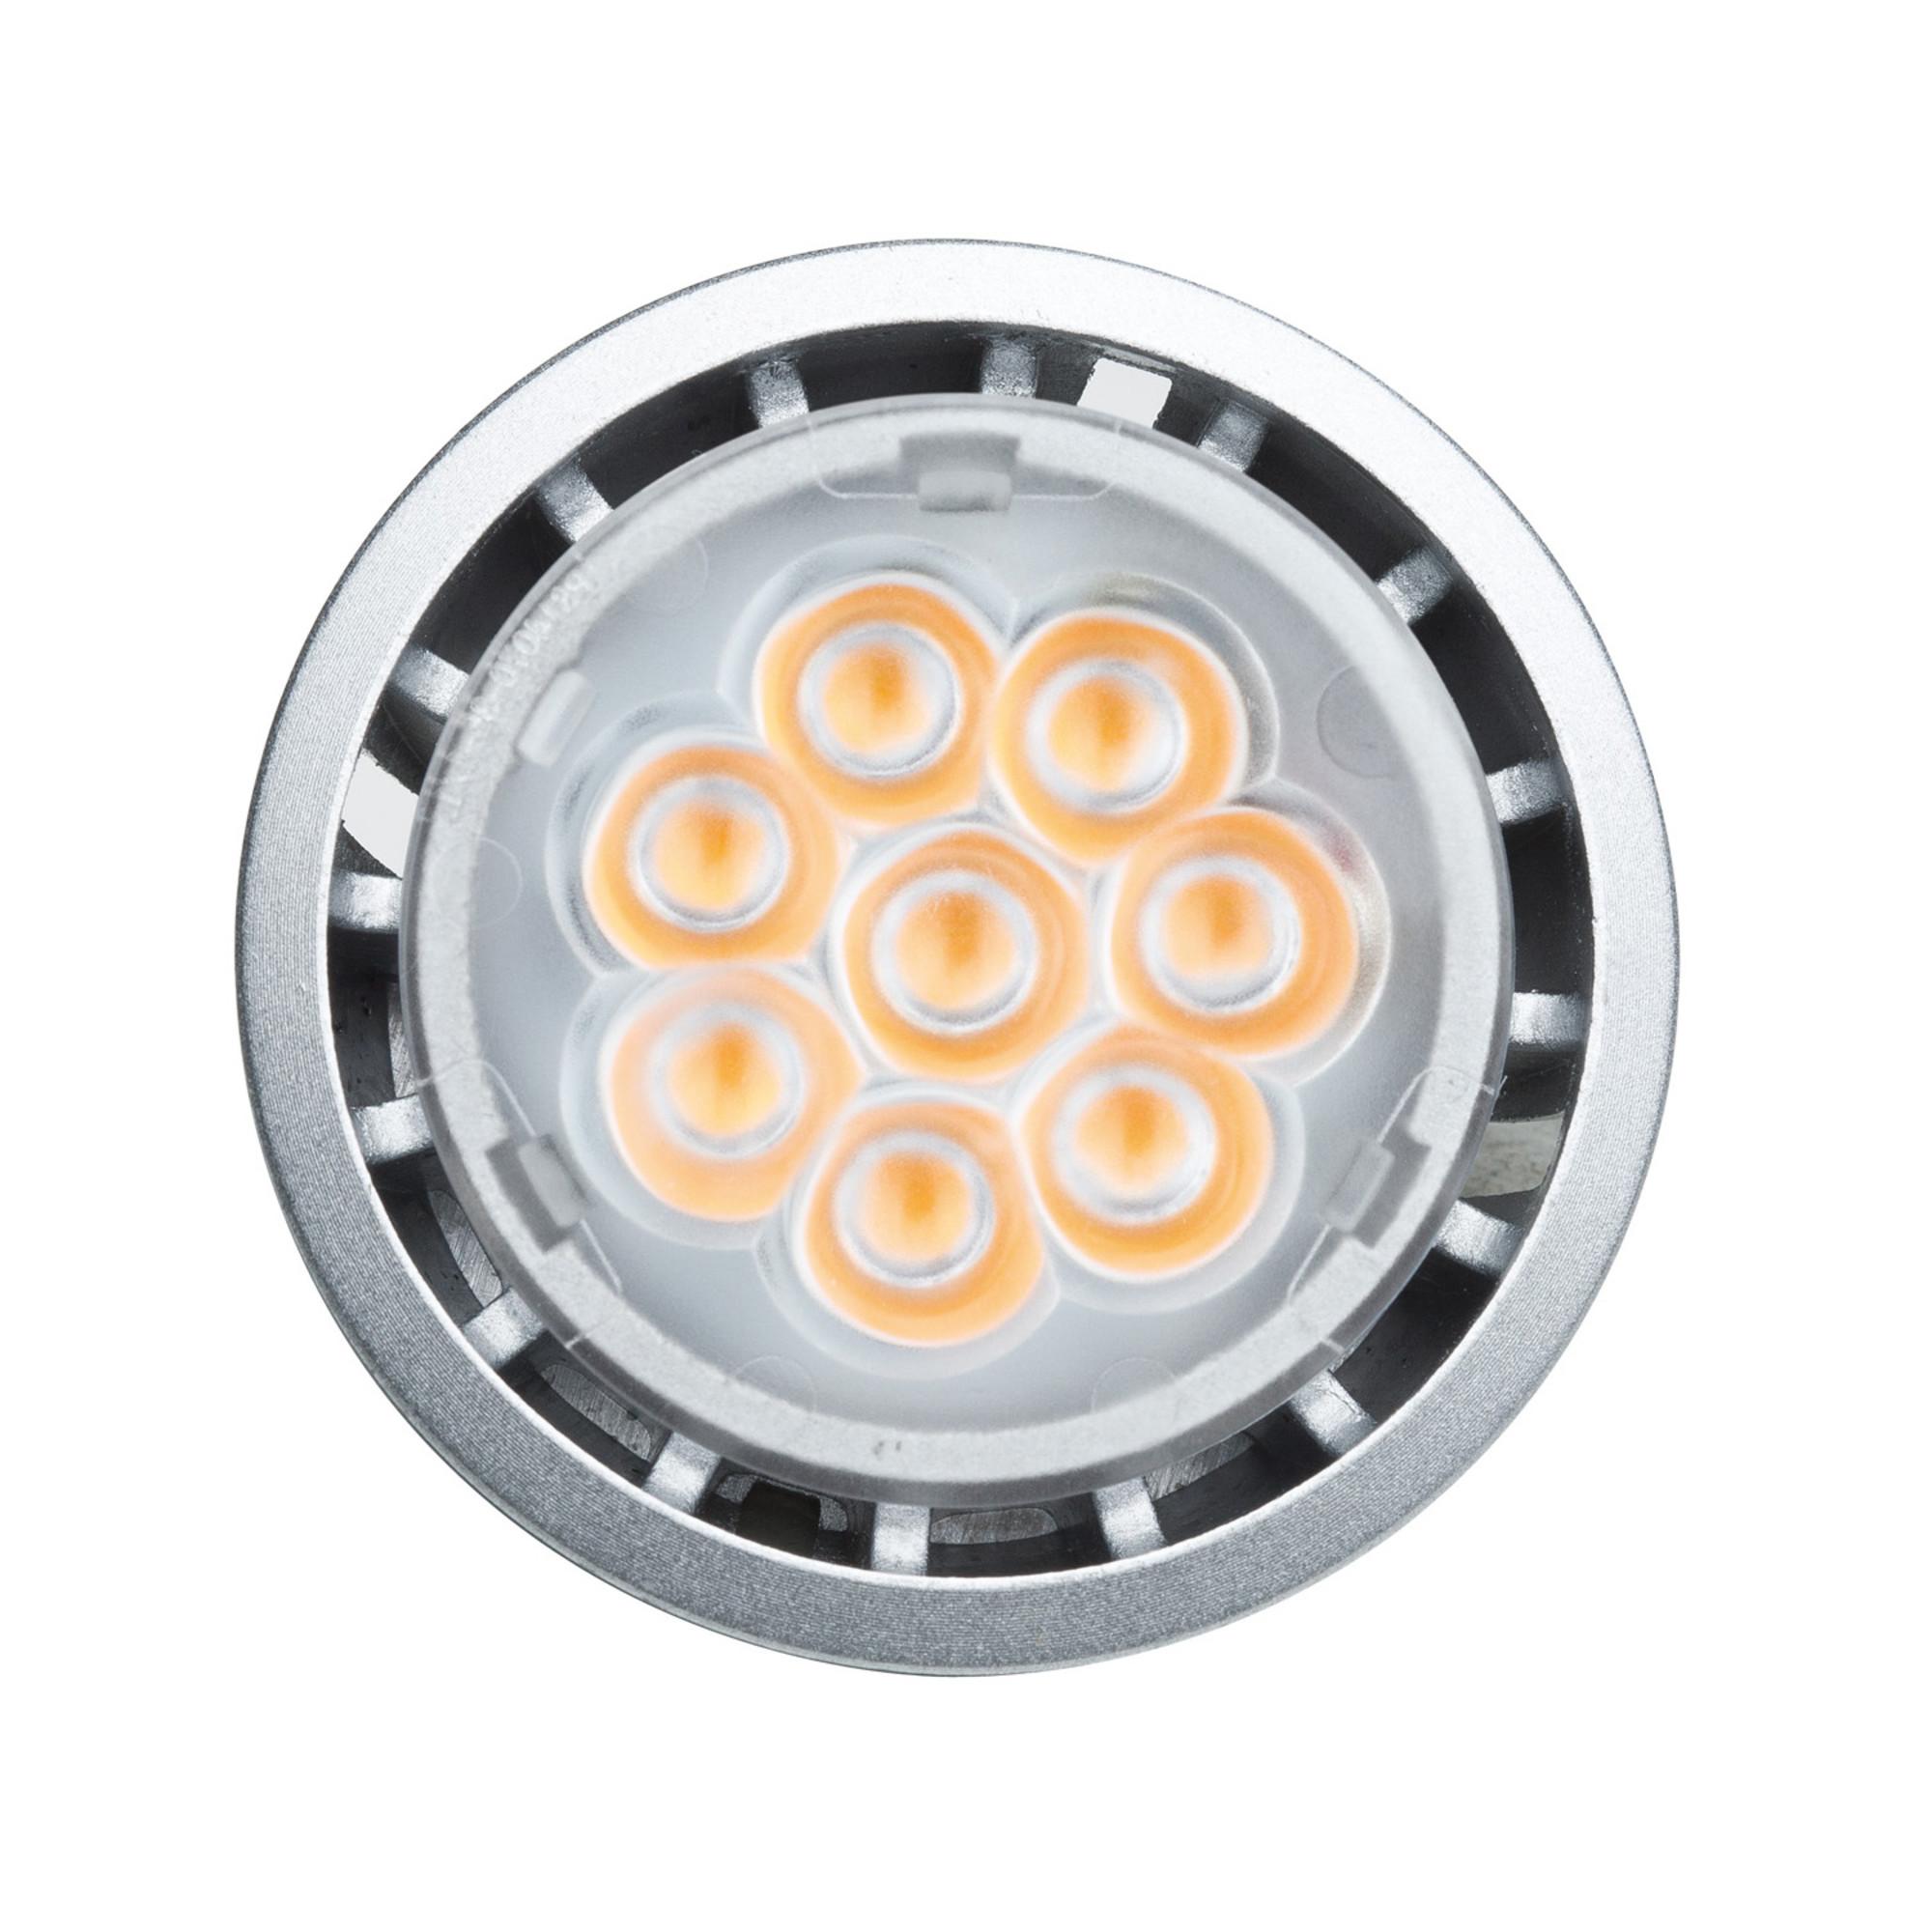 Лампа светодиодная Paulmann 28206 GU10 430 Лм теплый свет